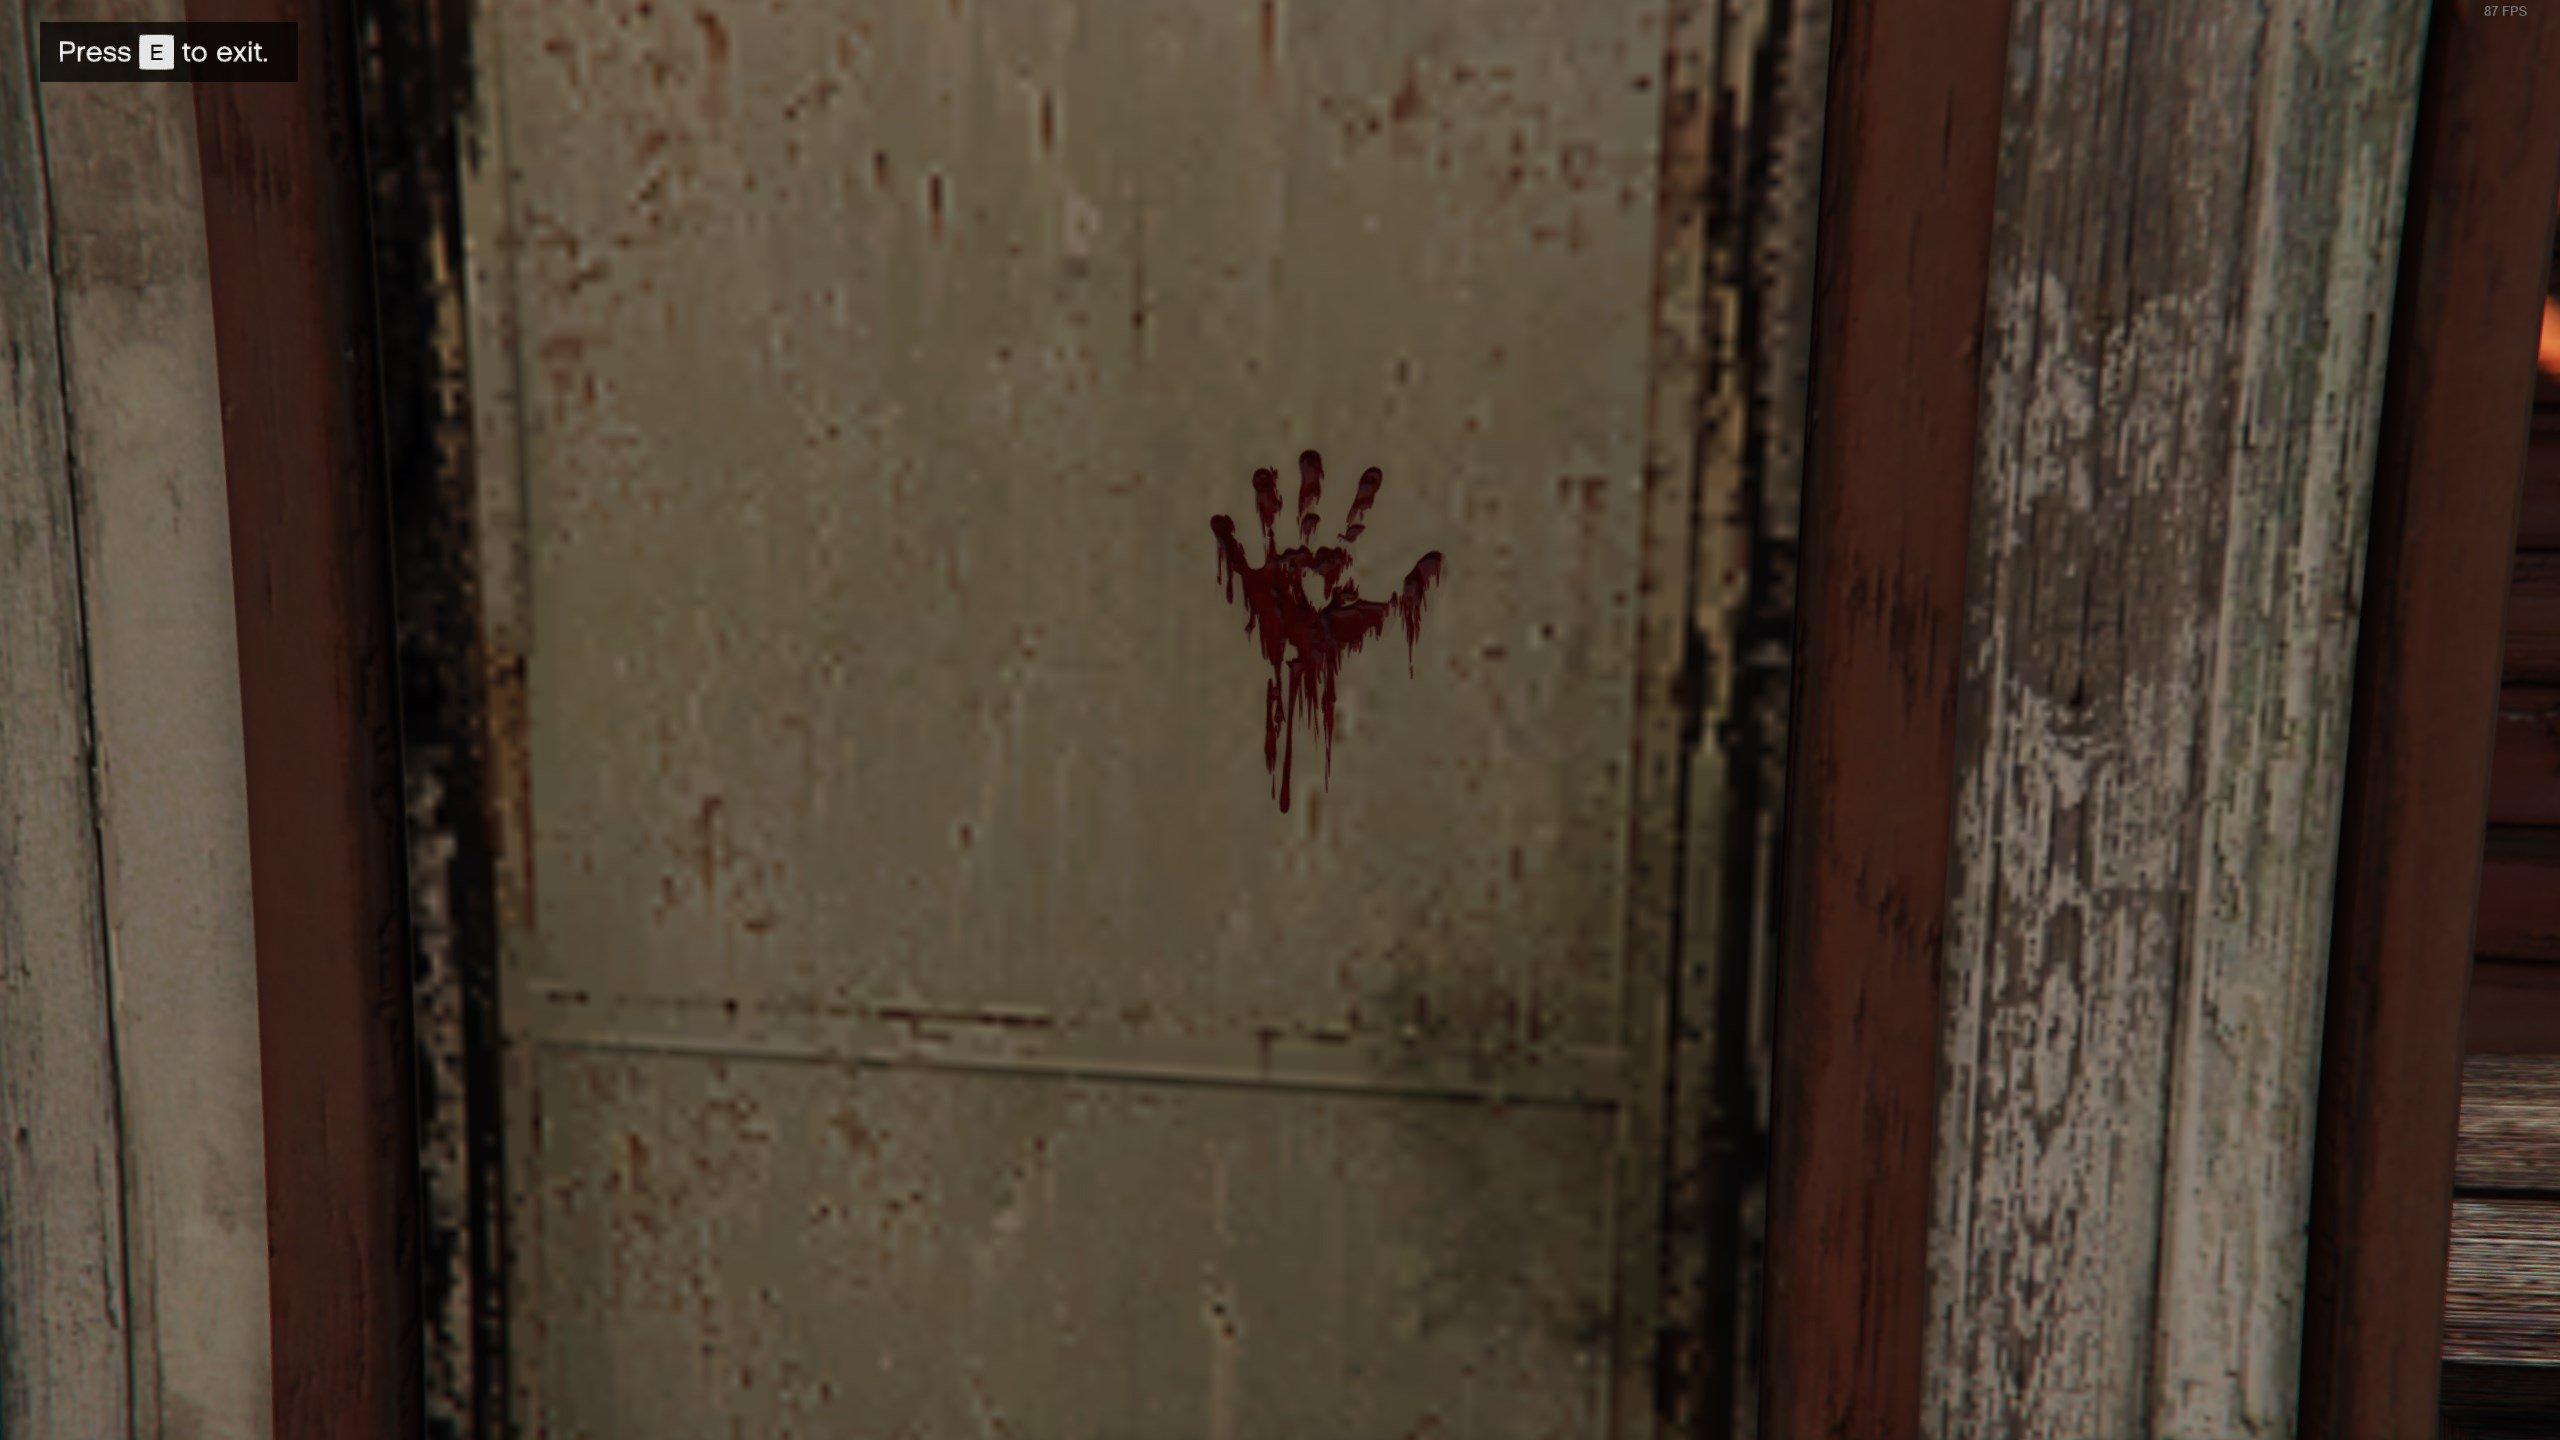 Slasher Clue 1 - Bloody Handprint - GTAO